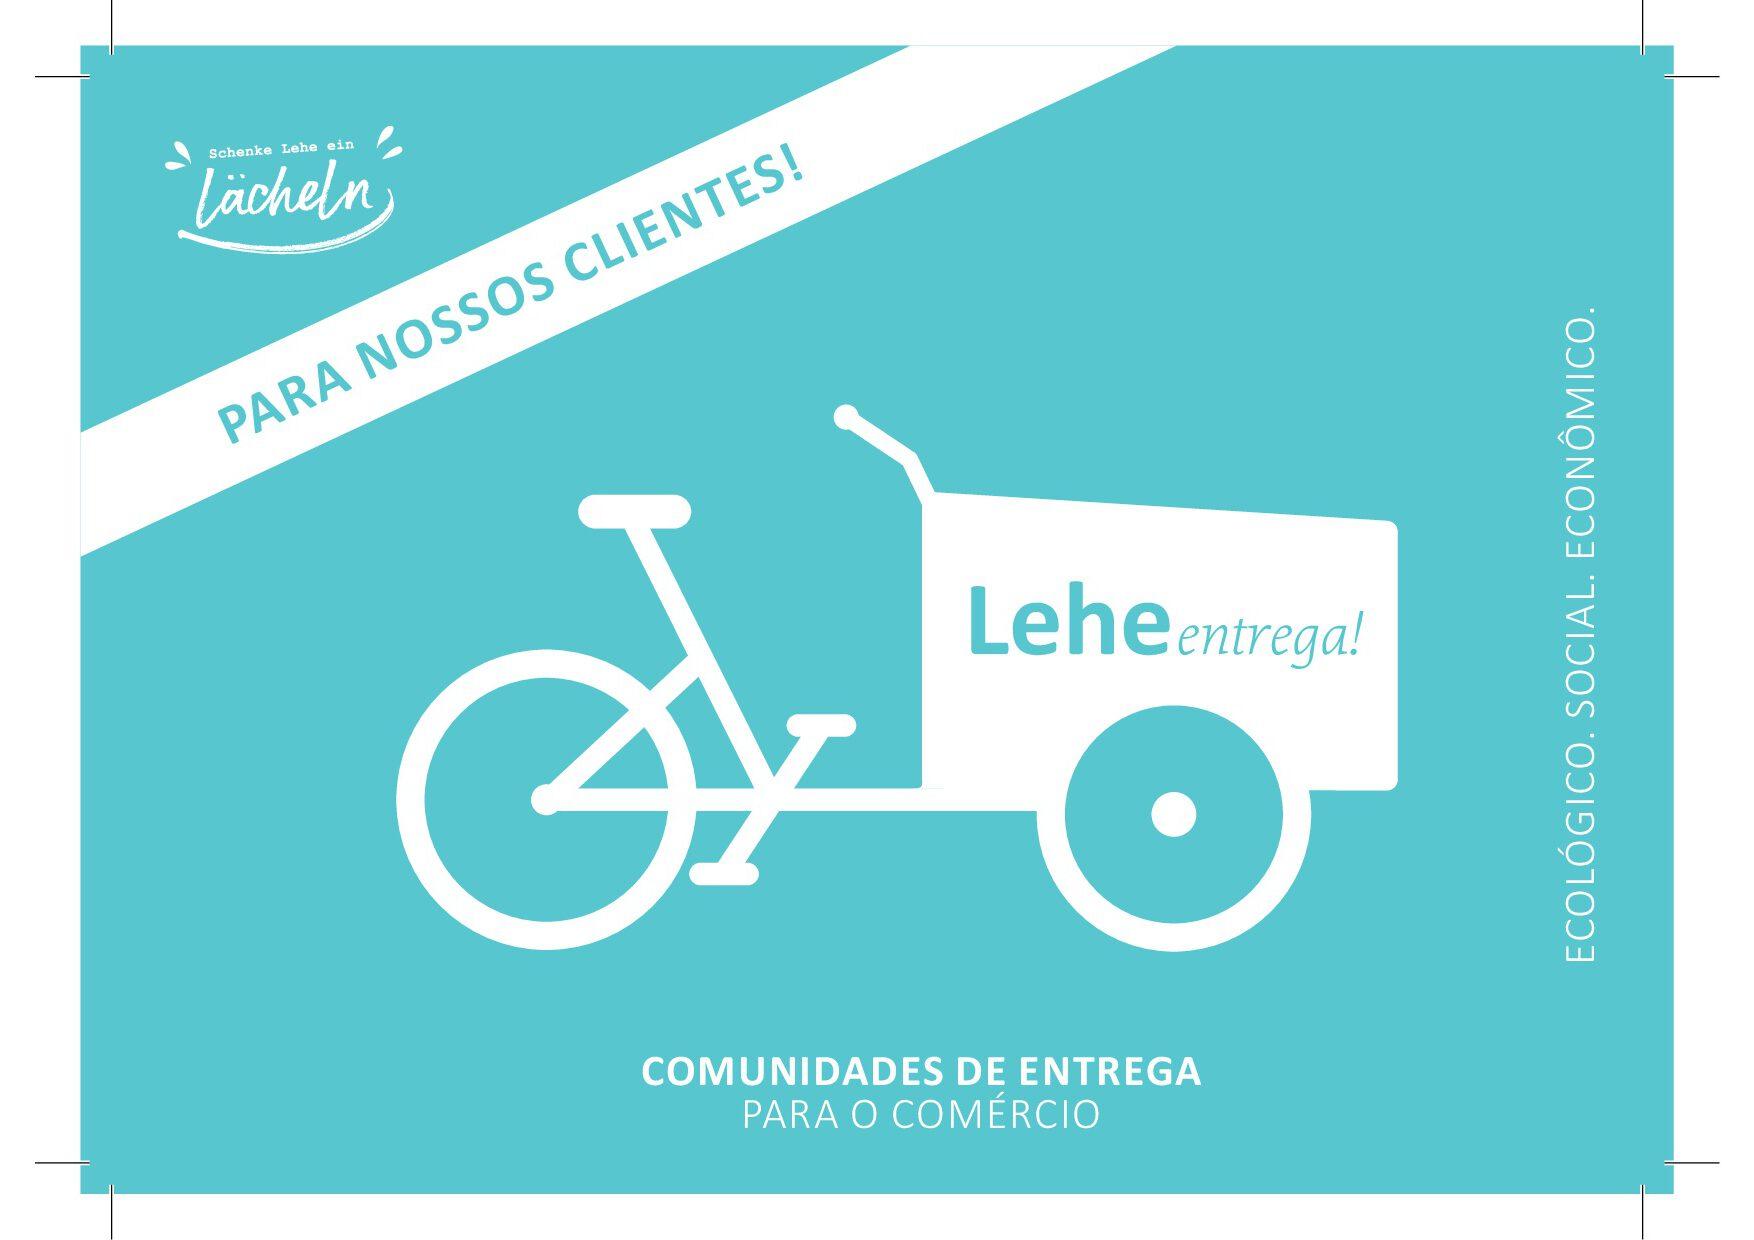 Lehe Liefert Portugiesisch Kunden